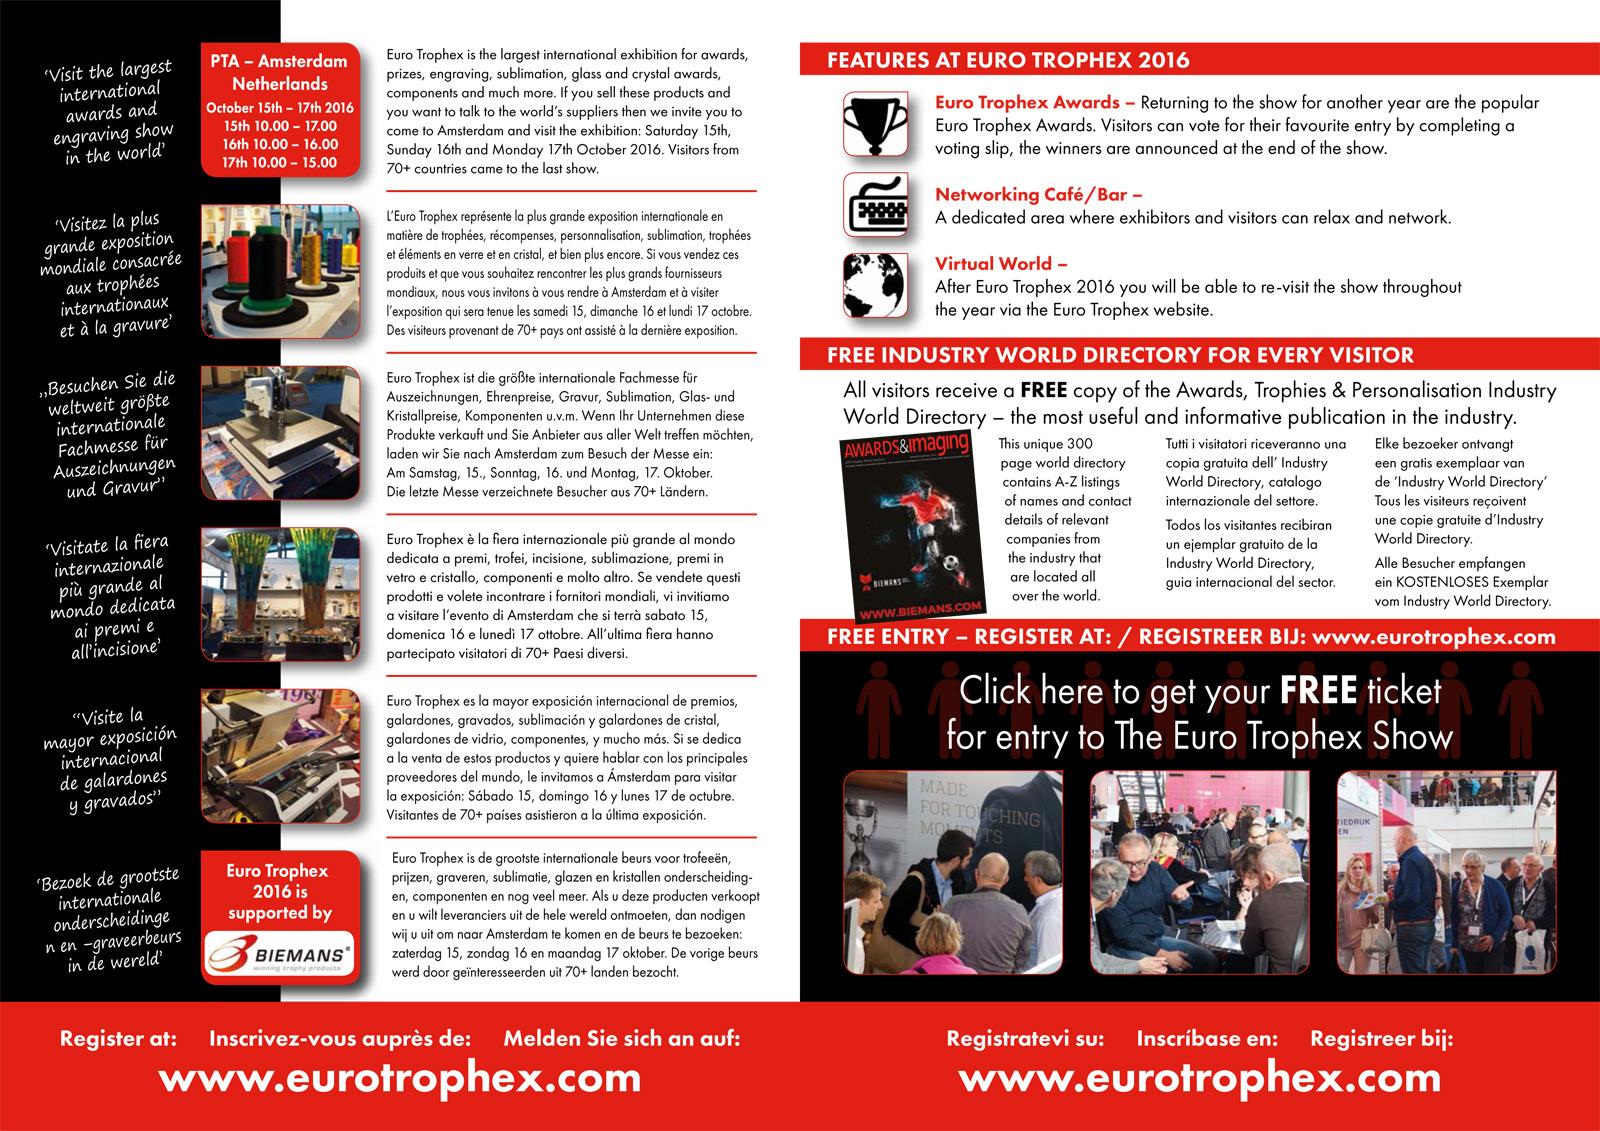 EUROTROPHEX SHOW 2016 – AMSTERDAM